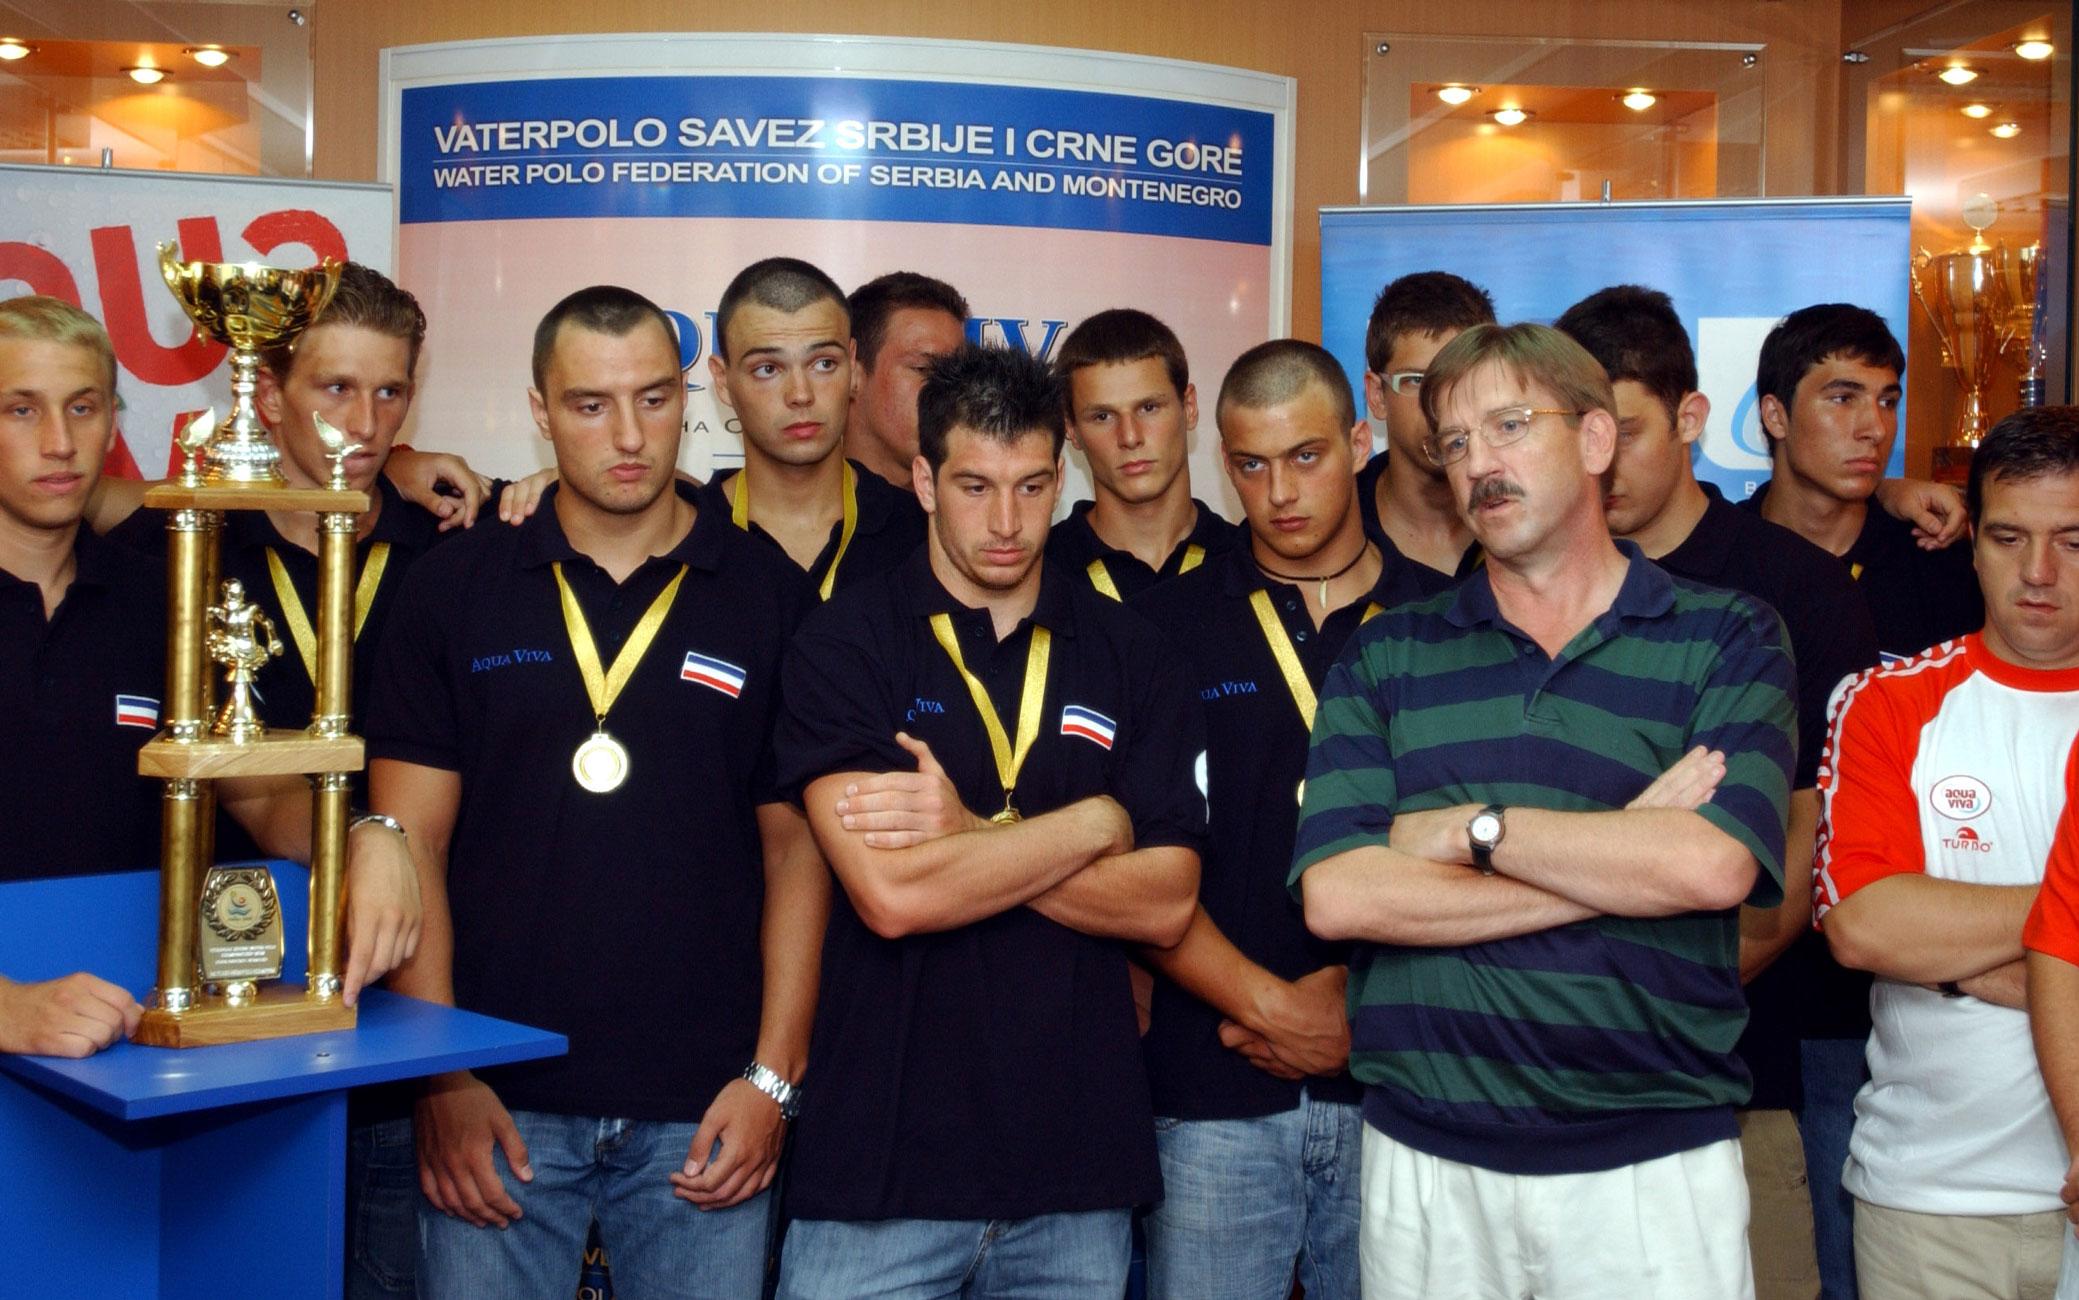 2006. (31.07.) Mlada vaterpolo reprezentacija SiCG, sampion Evrope, po povratku sa prvenstva, i Nenad Manojlovic.jpg